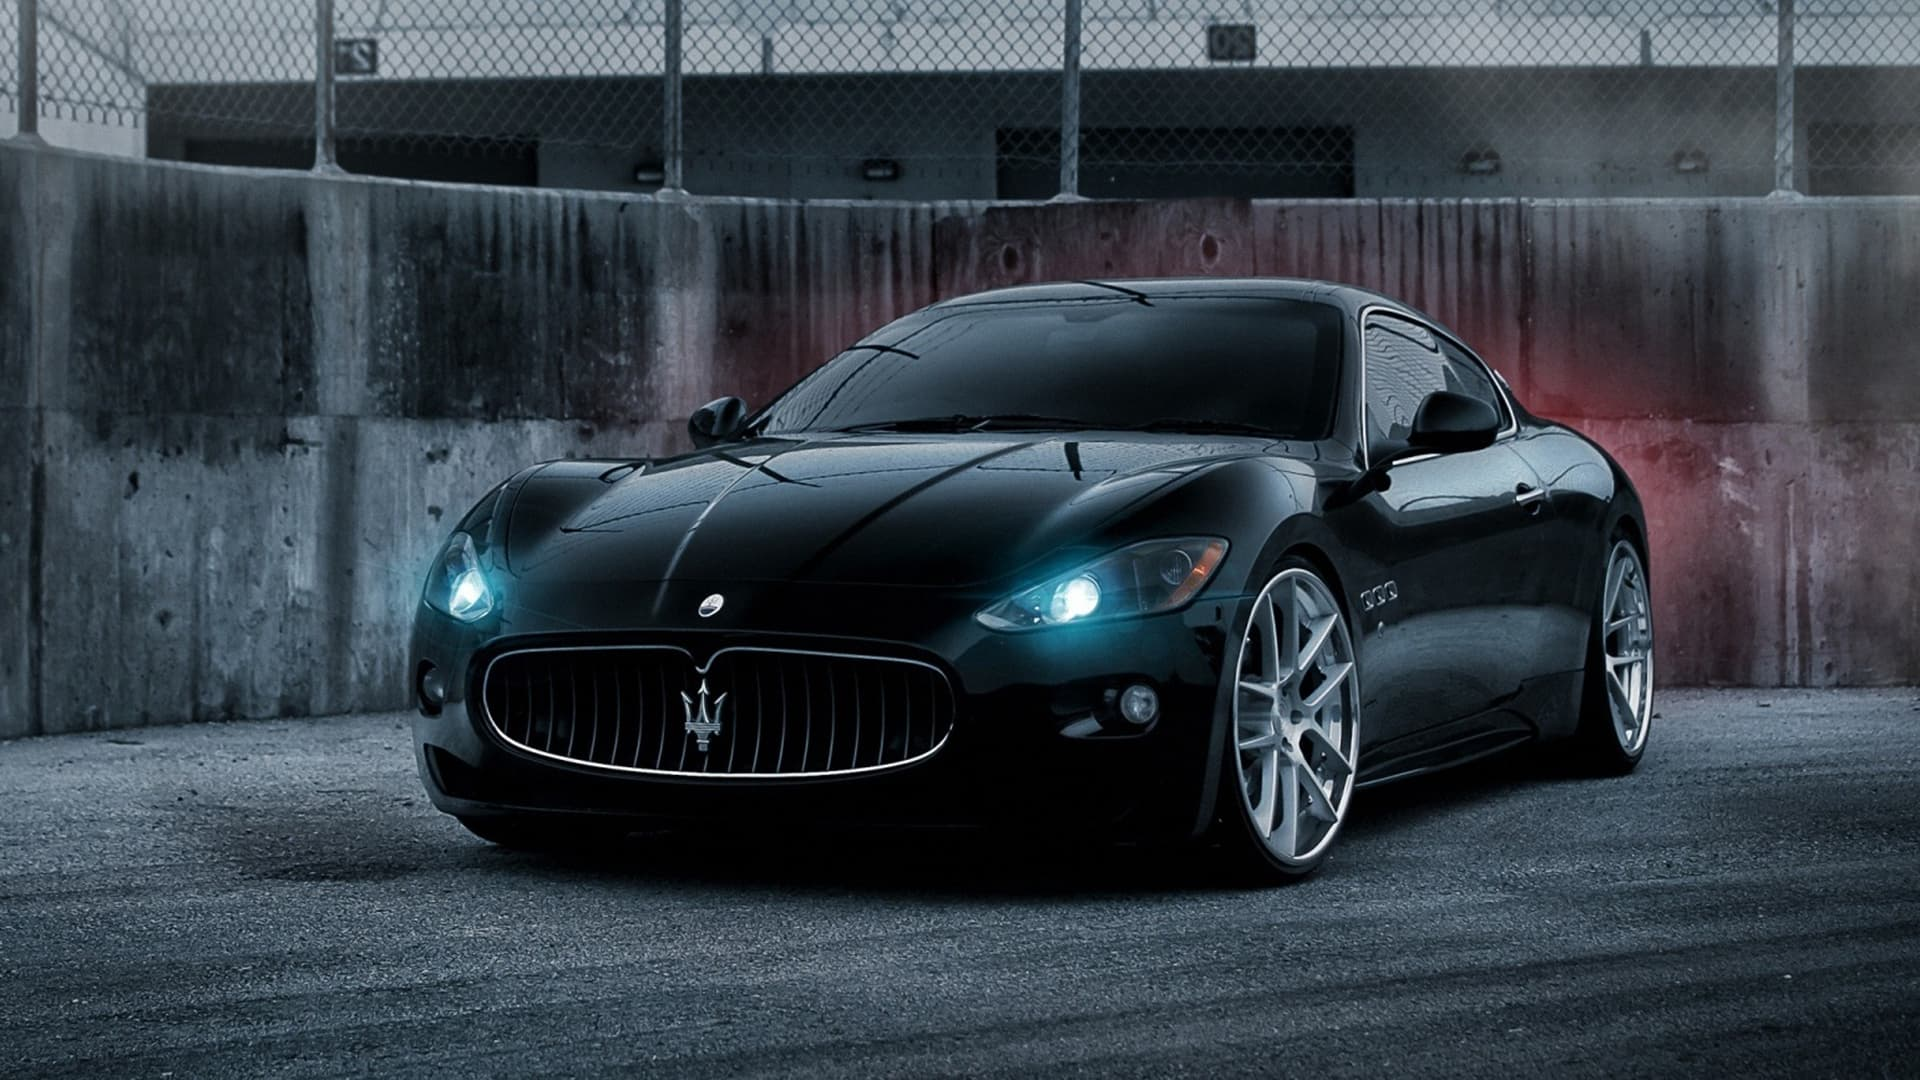 30 Maserati GranTurismo Wallpapers High Resolution Download